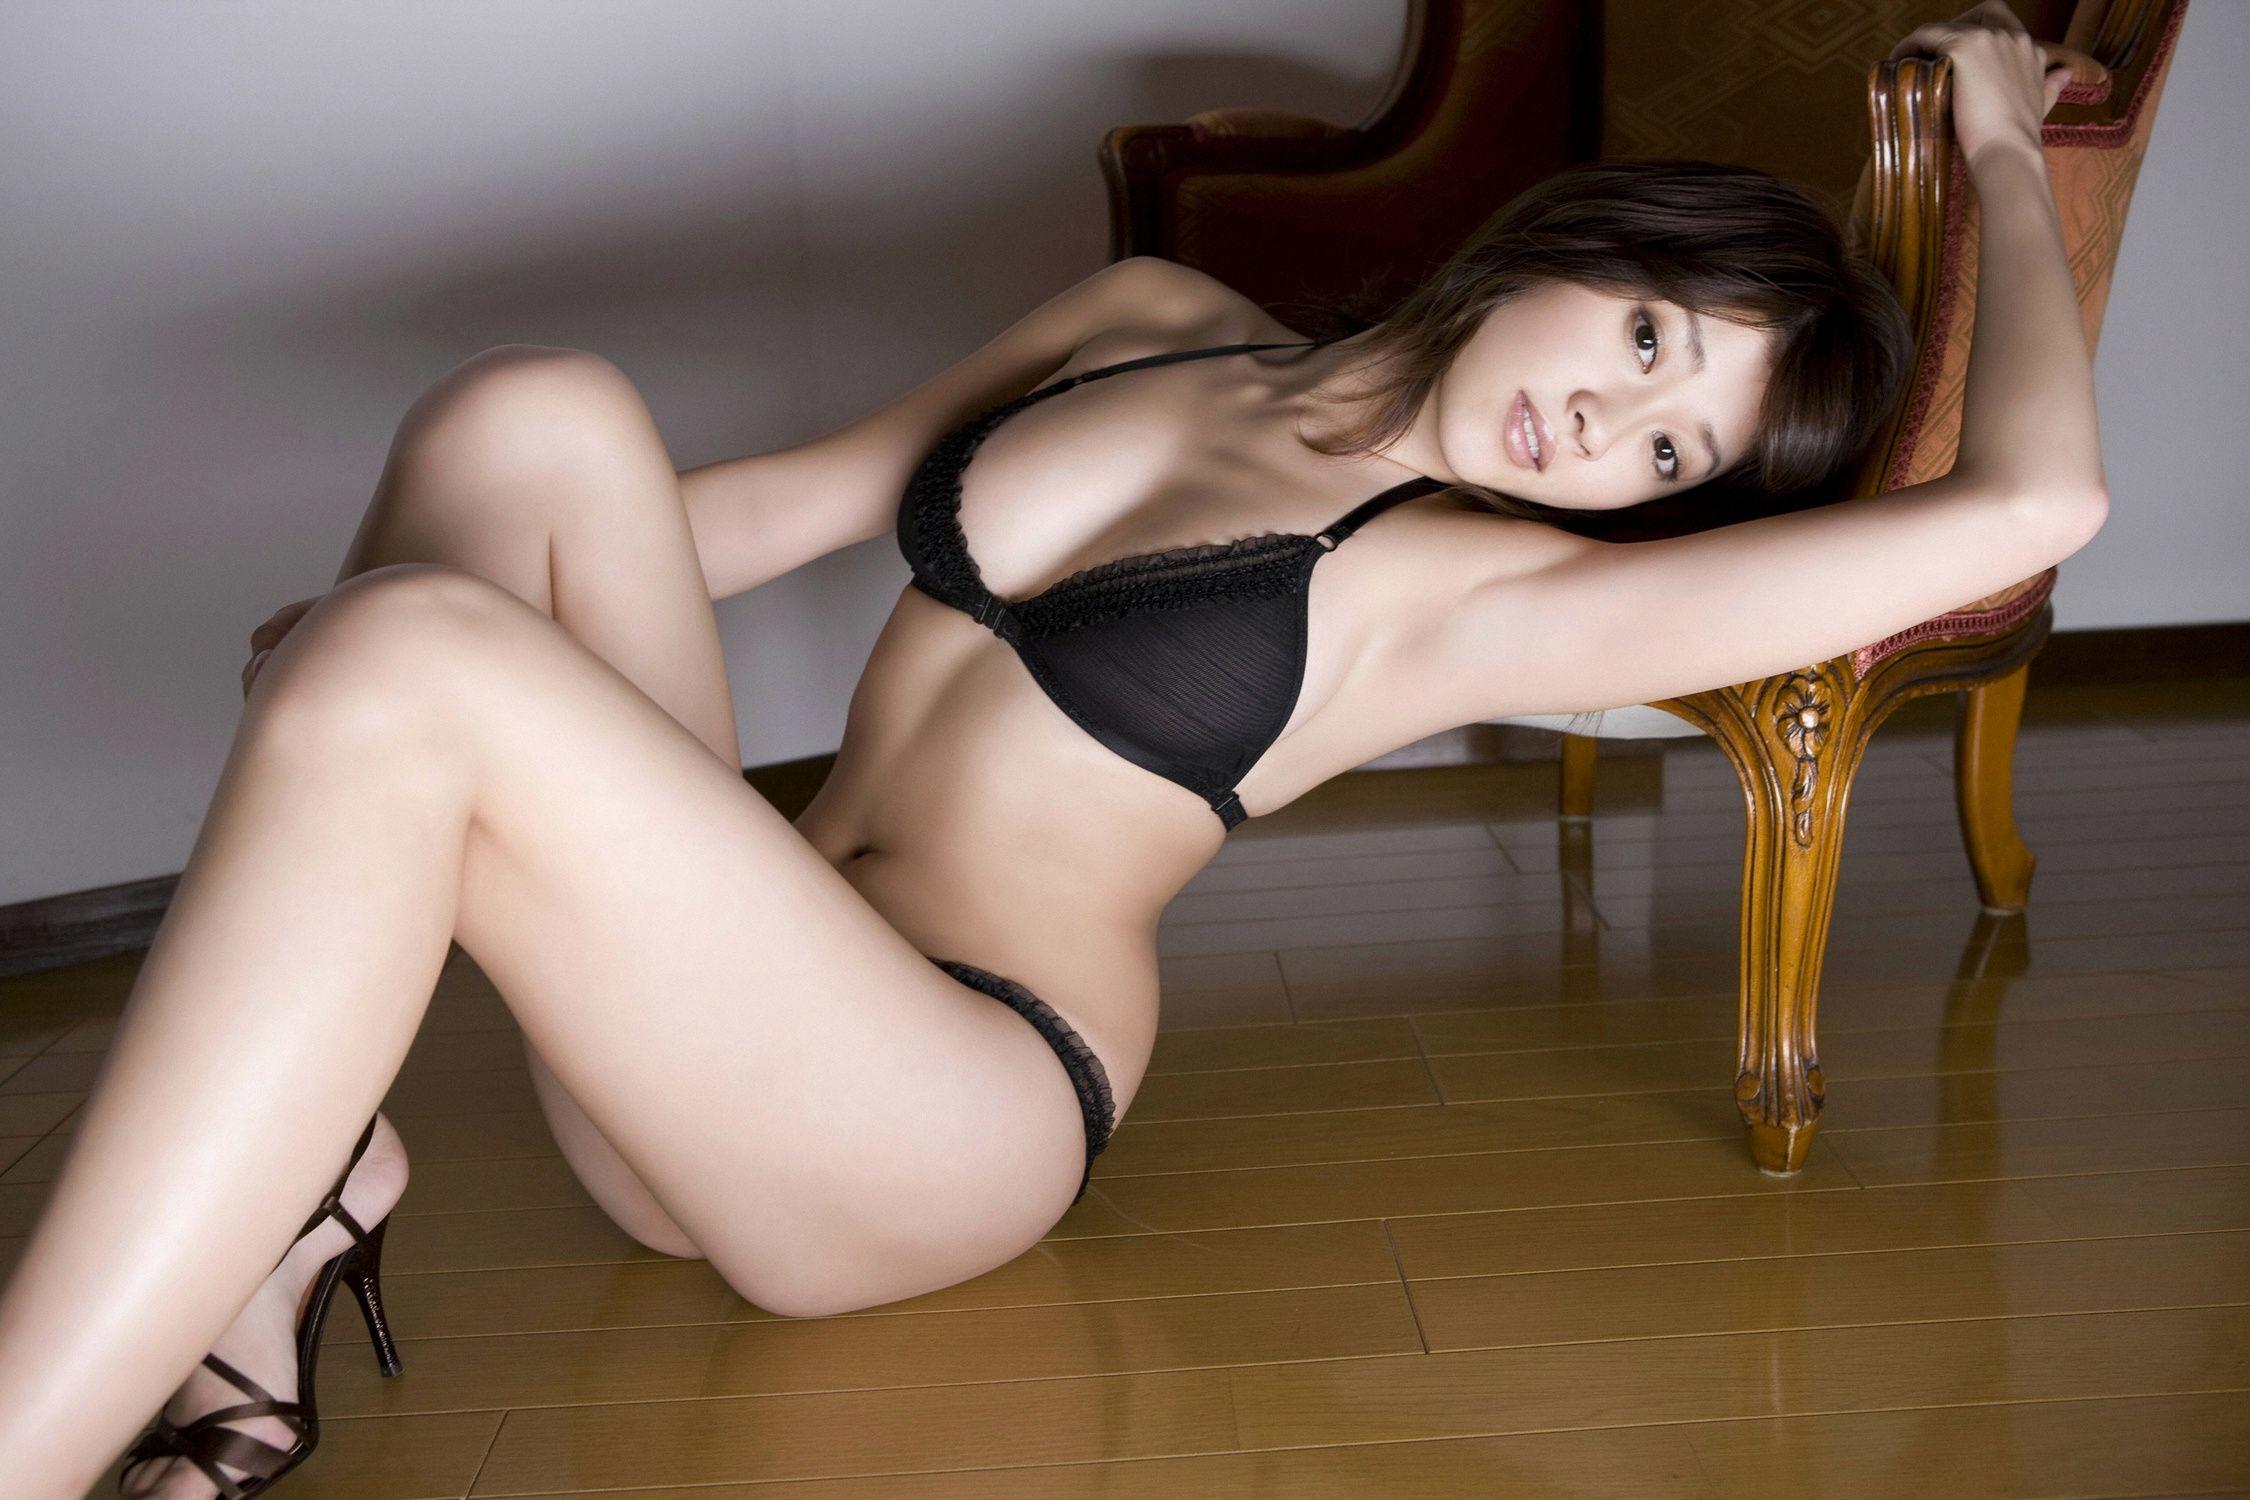 Asian Girls in Bra Photos